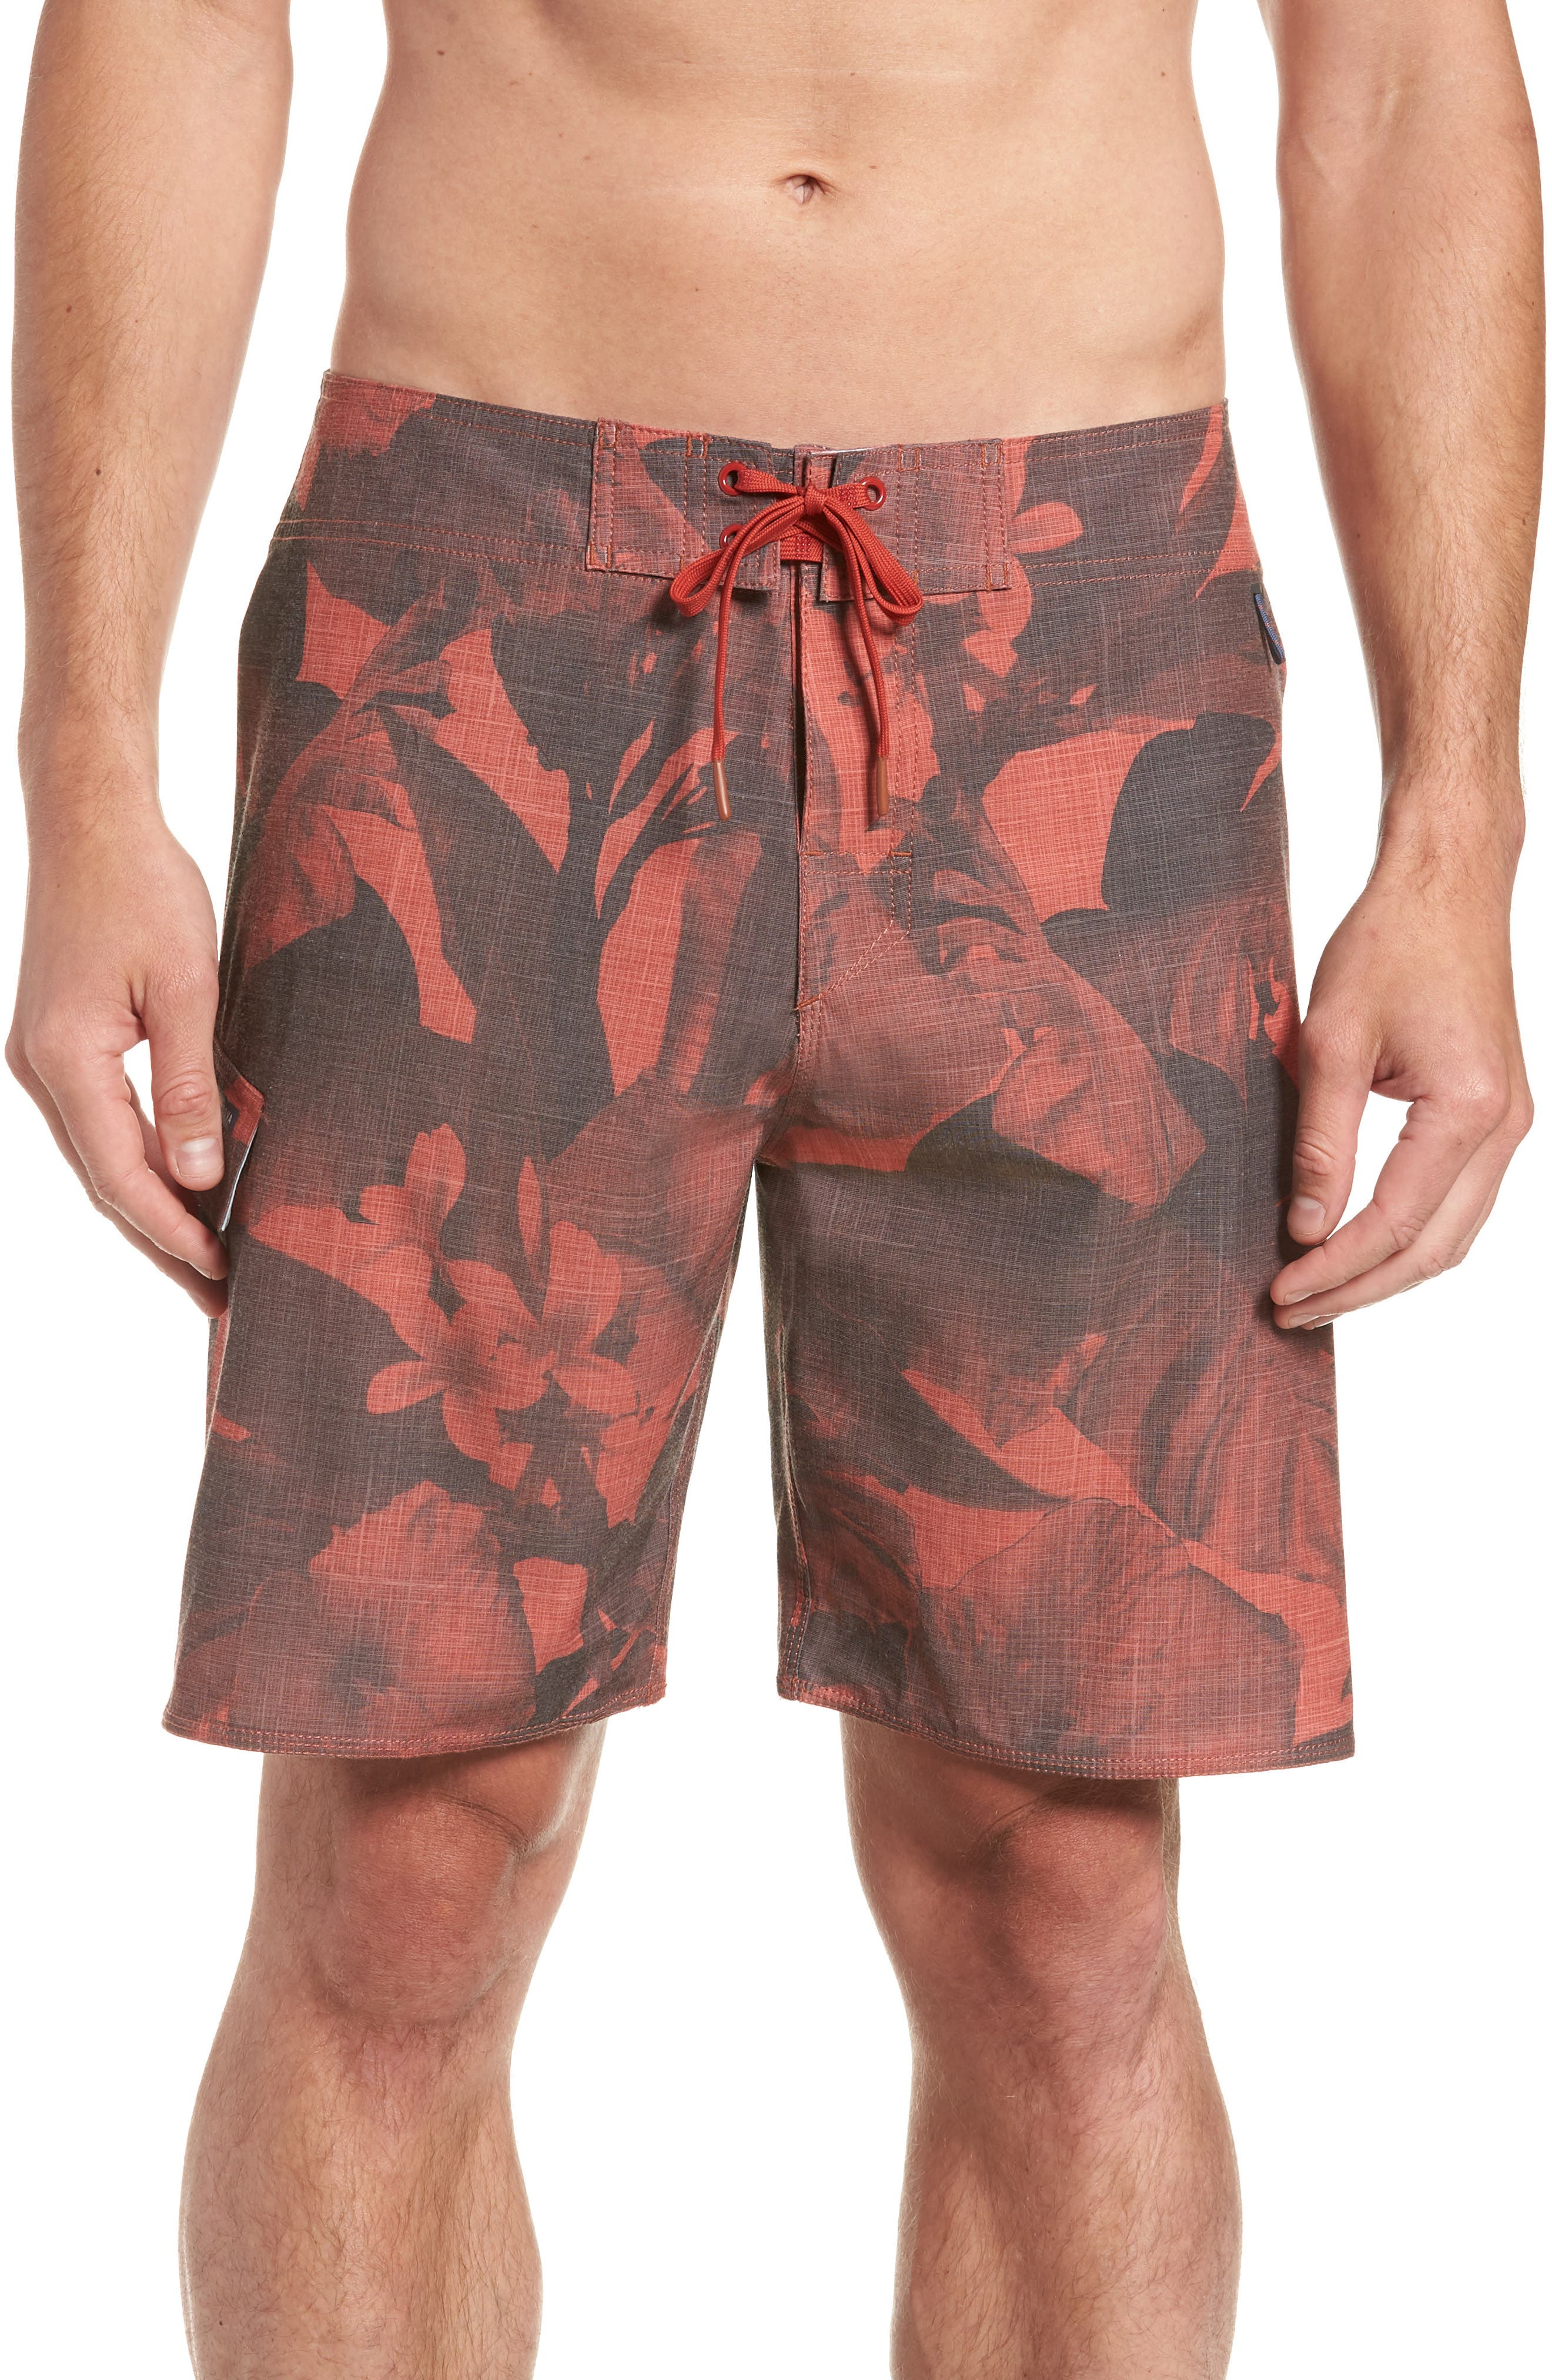 COVA Regular Fit Lazy Daze Board Shorts, Main, color, 602